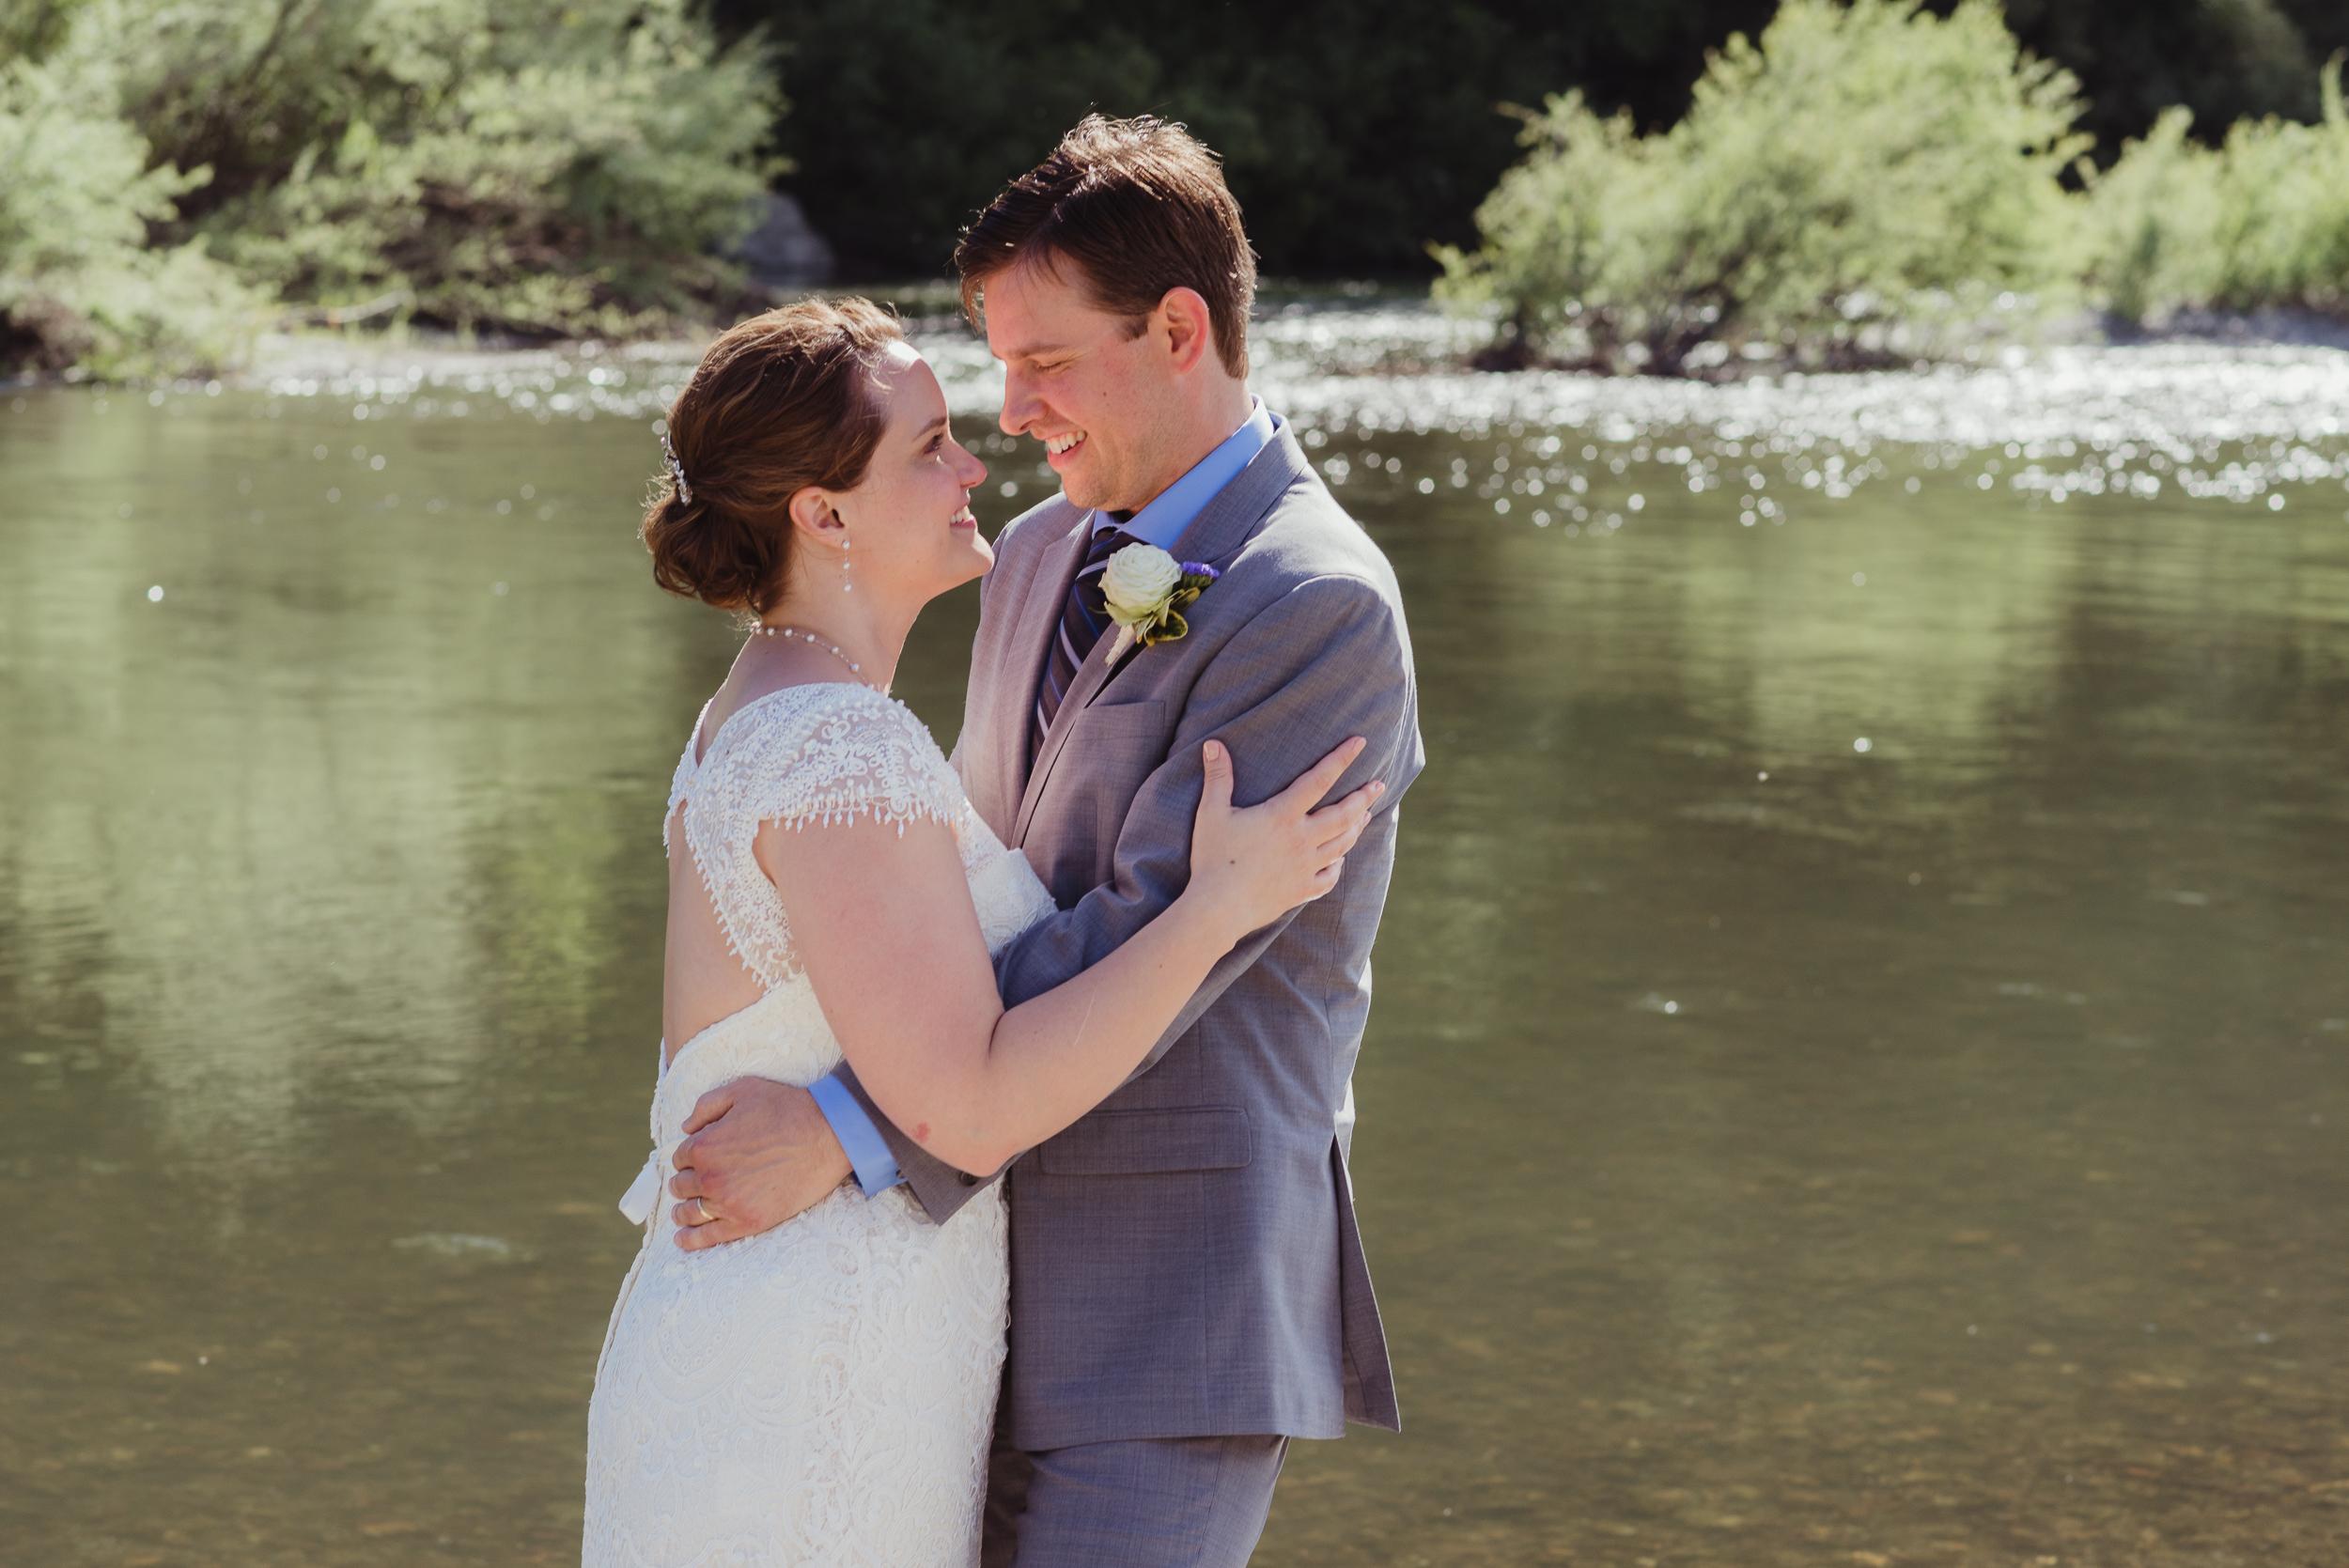 057-highland-dell-lodge-russian-river-wedding-vivianchen-400.jpg